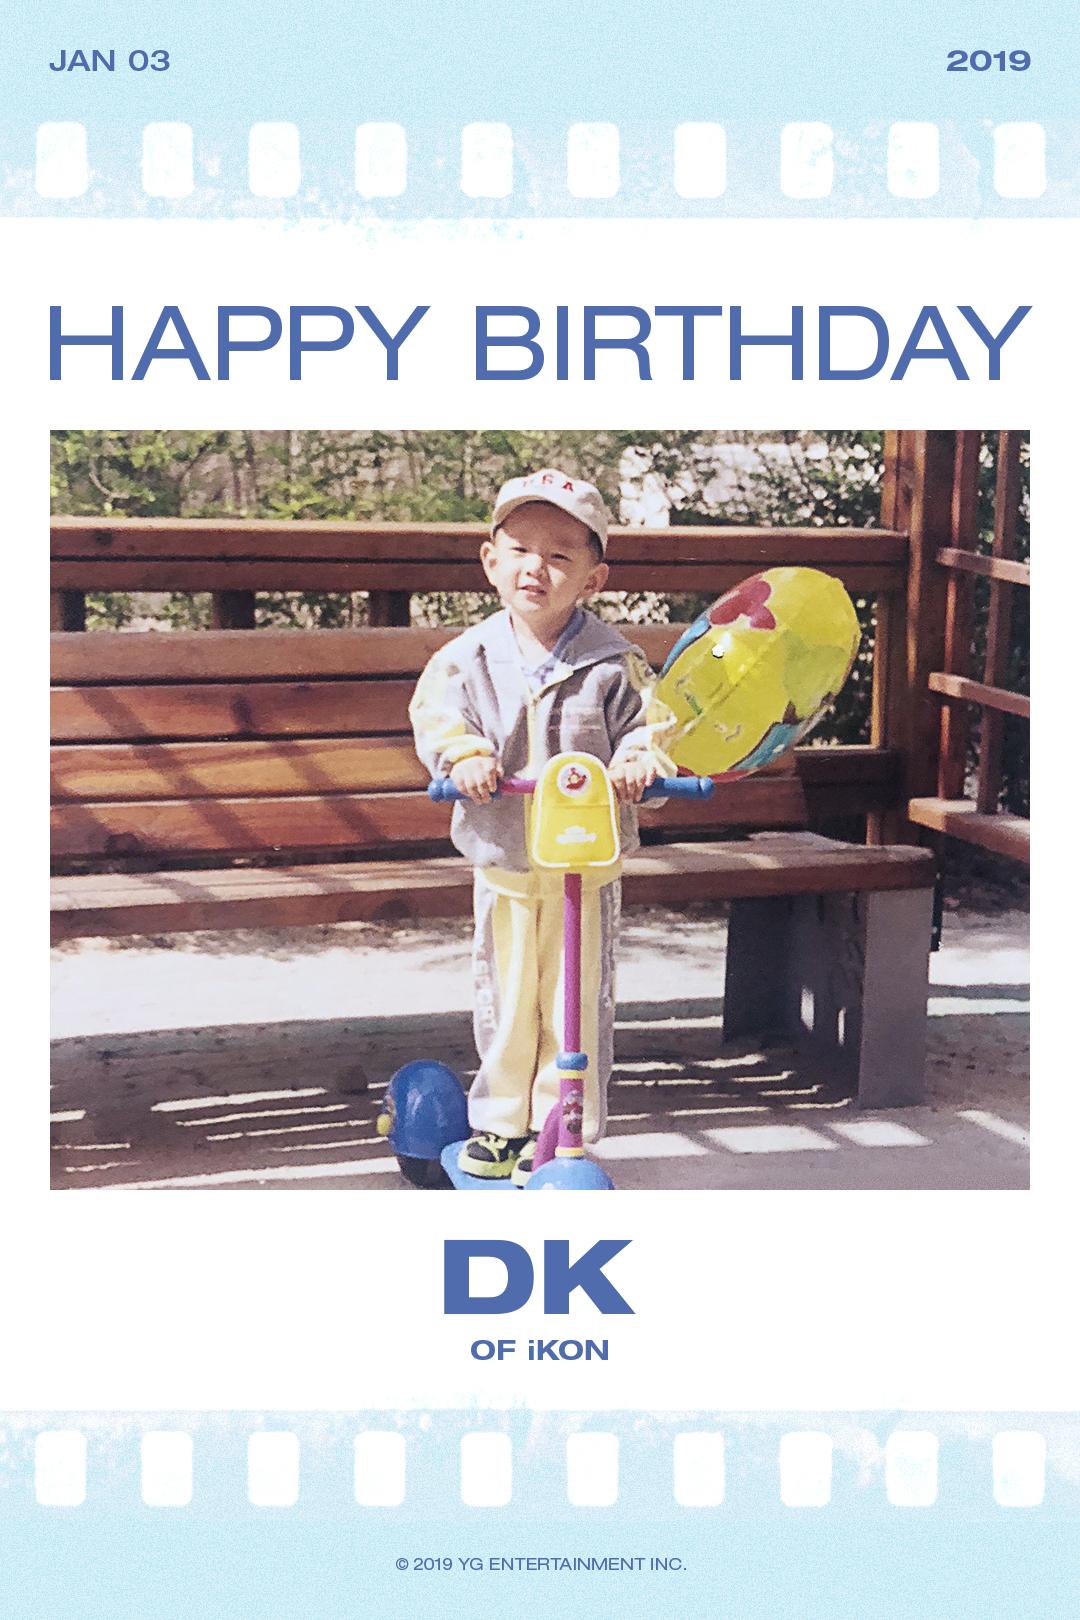 DK_HBD_web